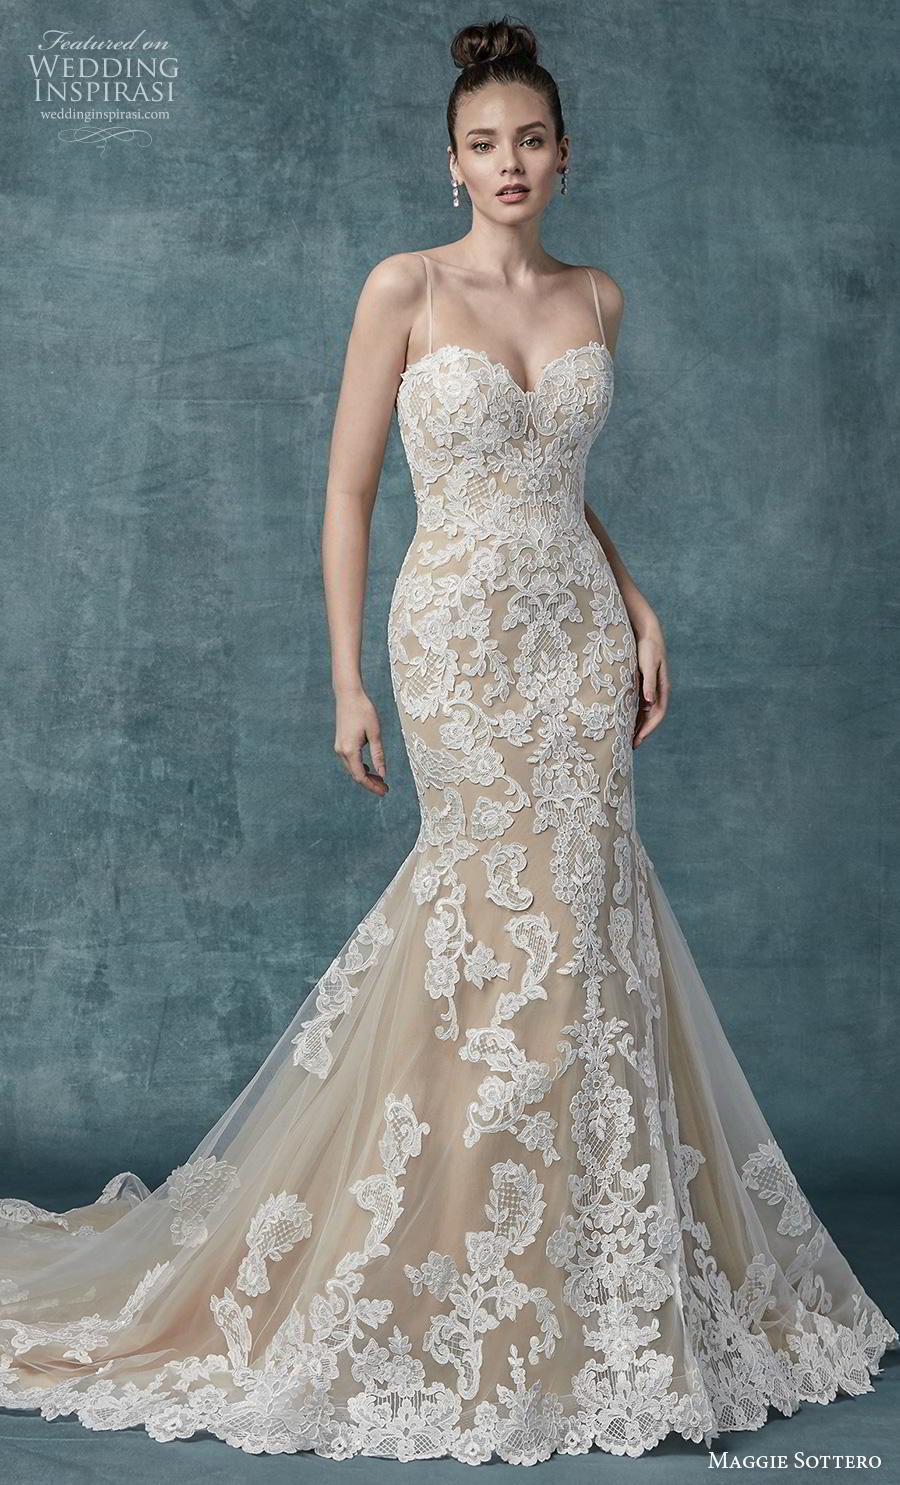 maggie sottero spring 2019 bridal sleeveless spaghetti strap sweetheart neckline full embellishment elegant ivory mermaid wedding dress mid back chapel train (11) mv